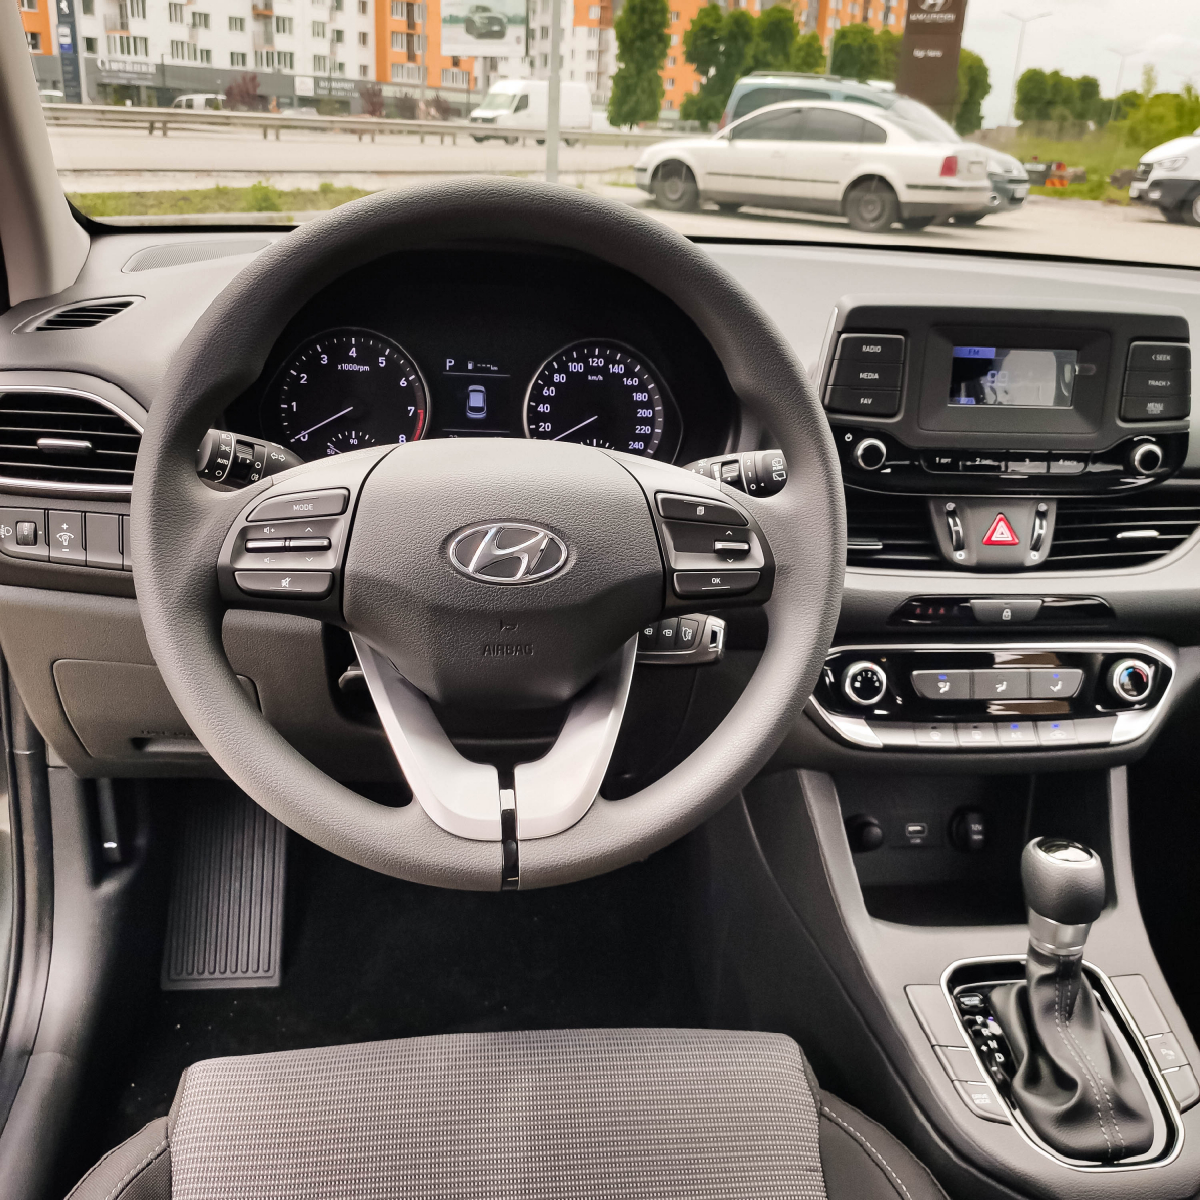 Спеціальна вигода на придбання Hyundai i30 WGN! | Хюндай Мотор Україна - фото 11